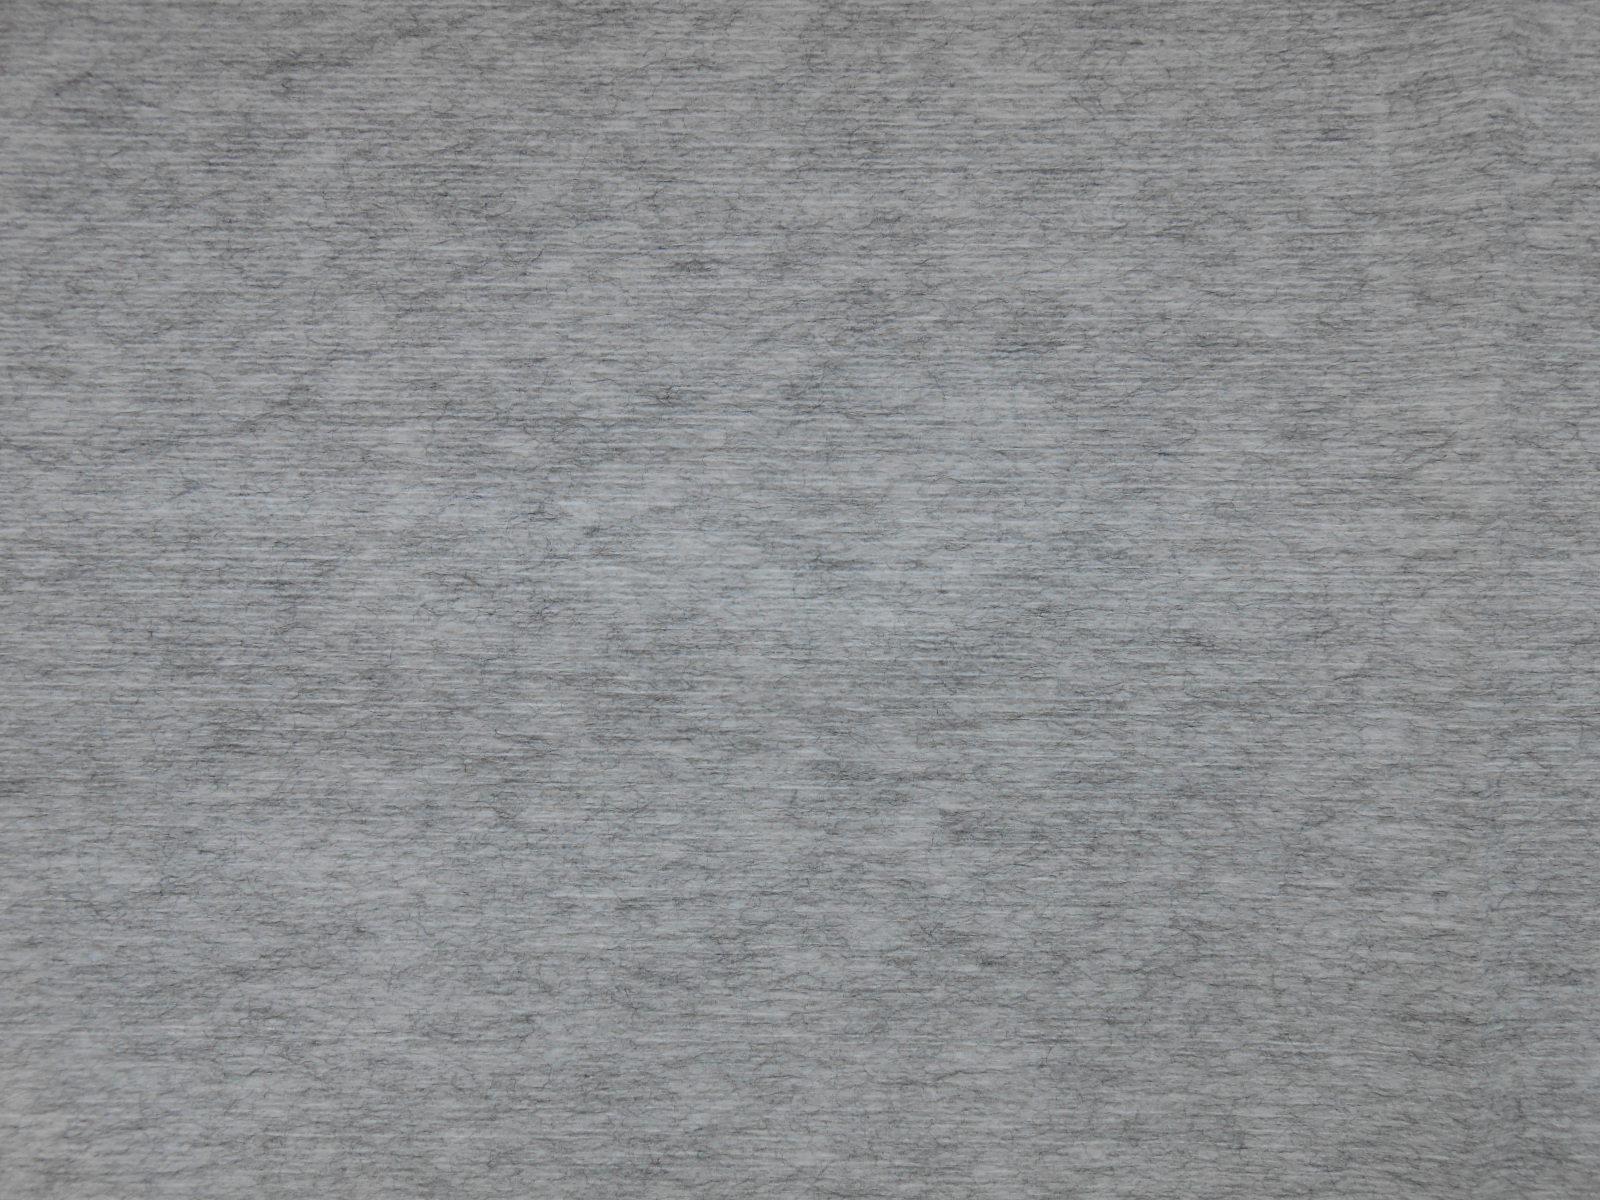 SOFTEXTRA grey perf.roll 38x40cm- 1x950s